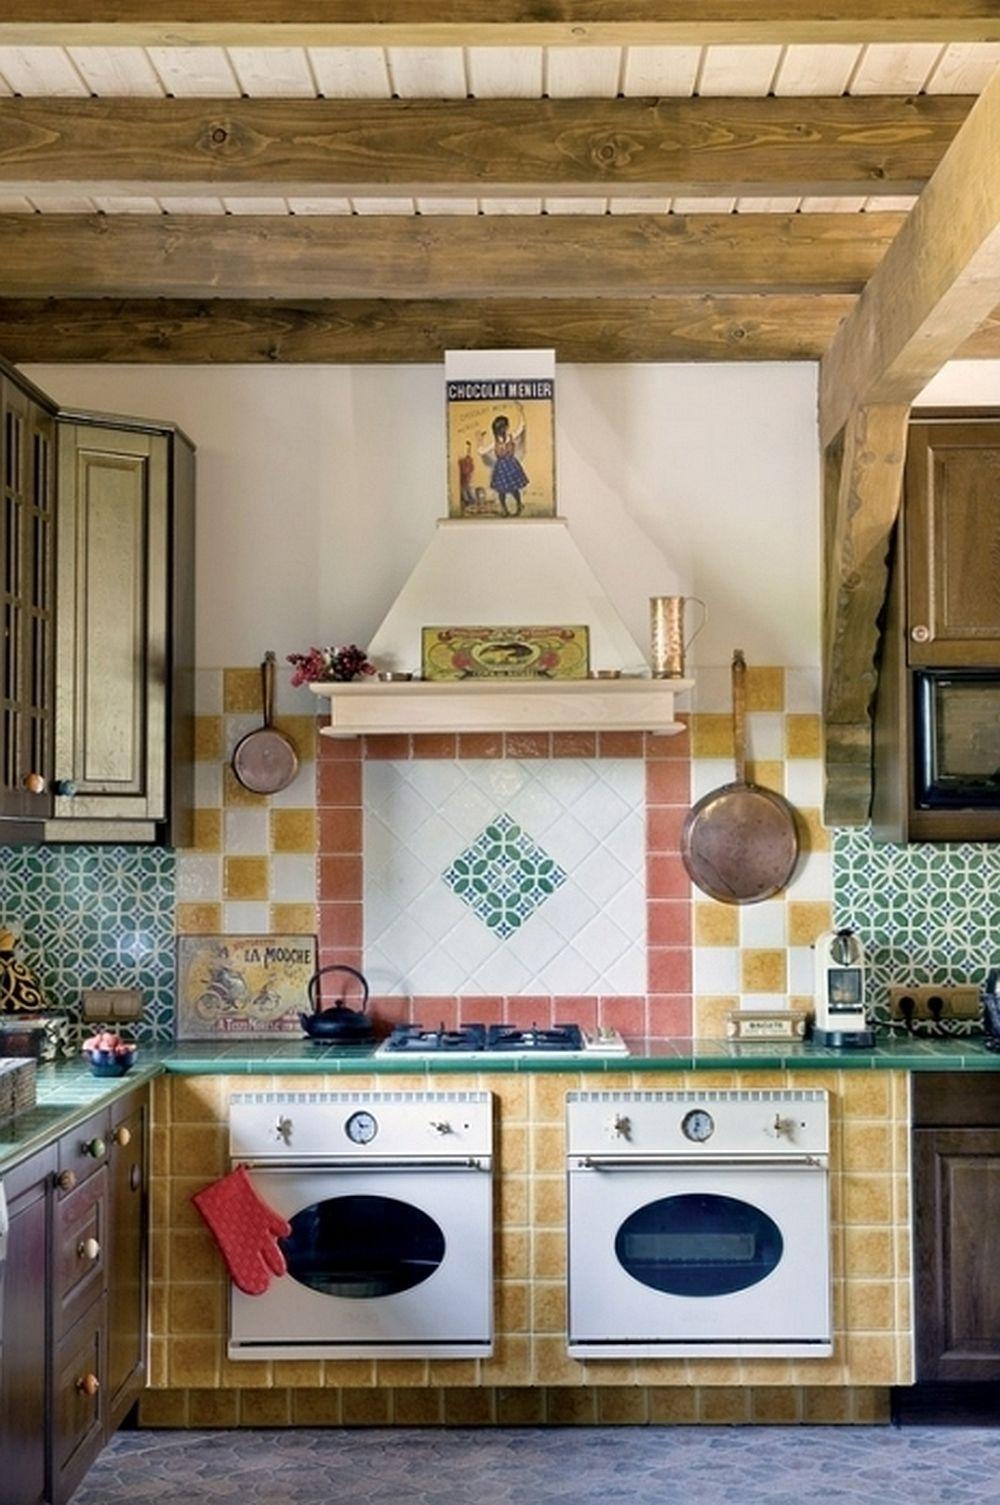 adelaparvu.com despre casa rustica cu influente franceze Foto Cuba Pajewski (12)